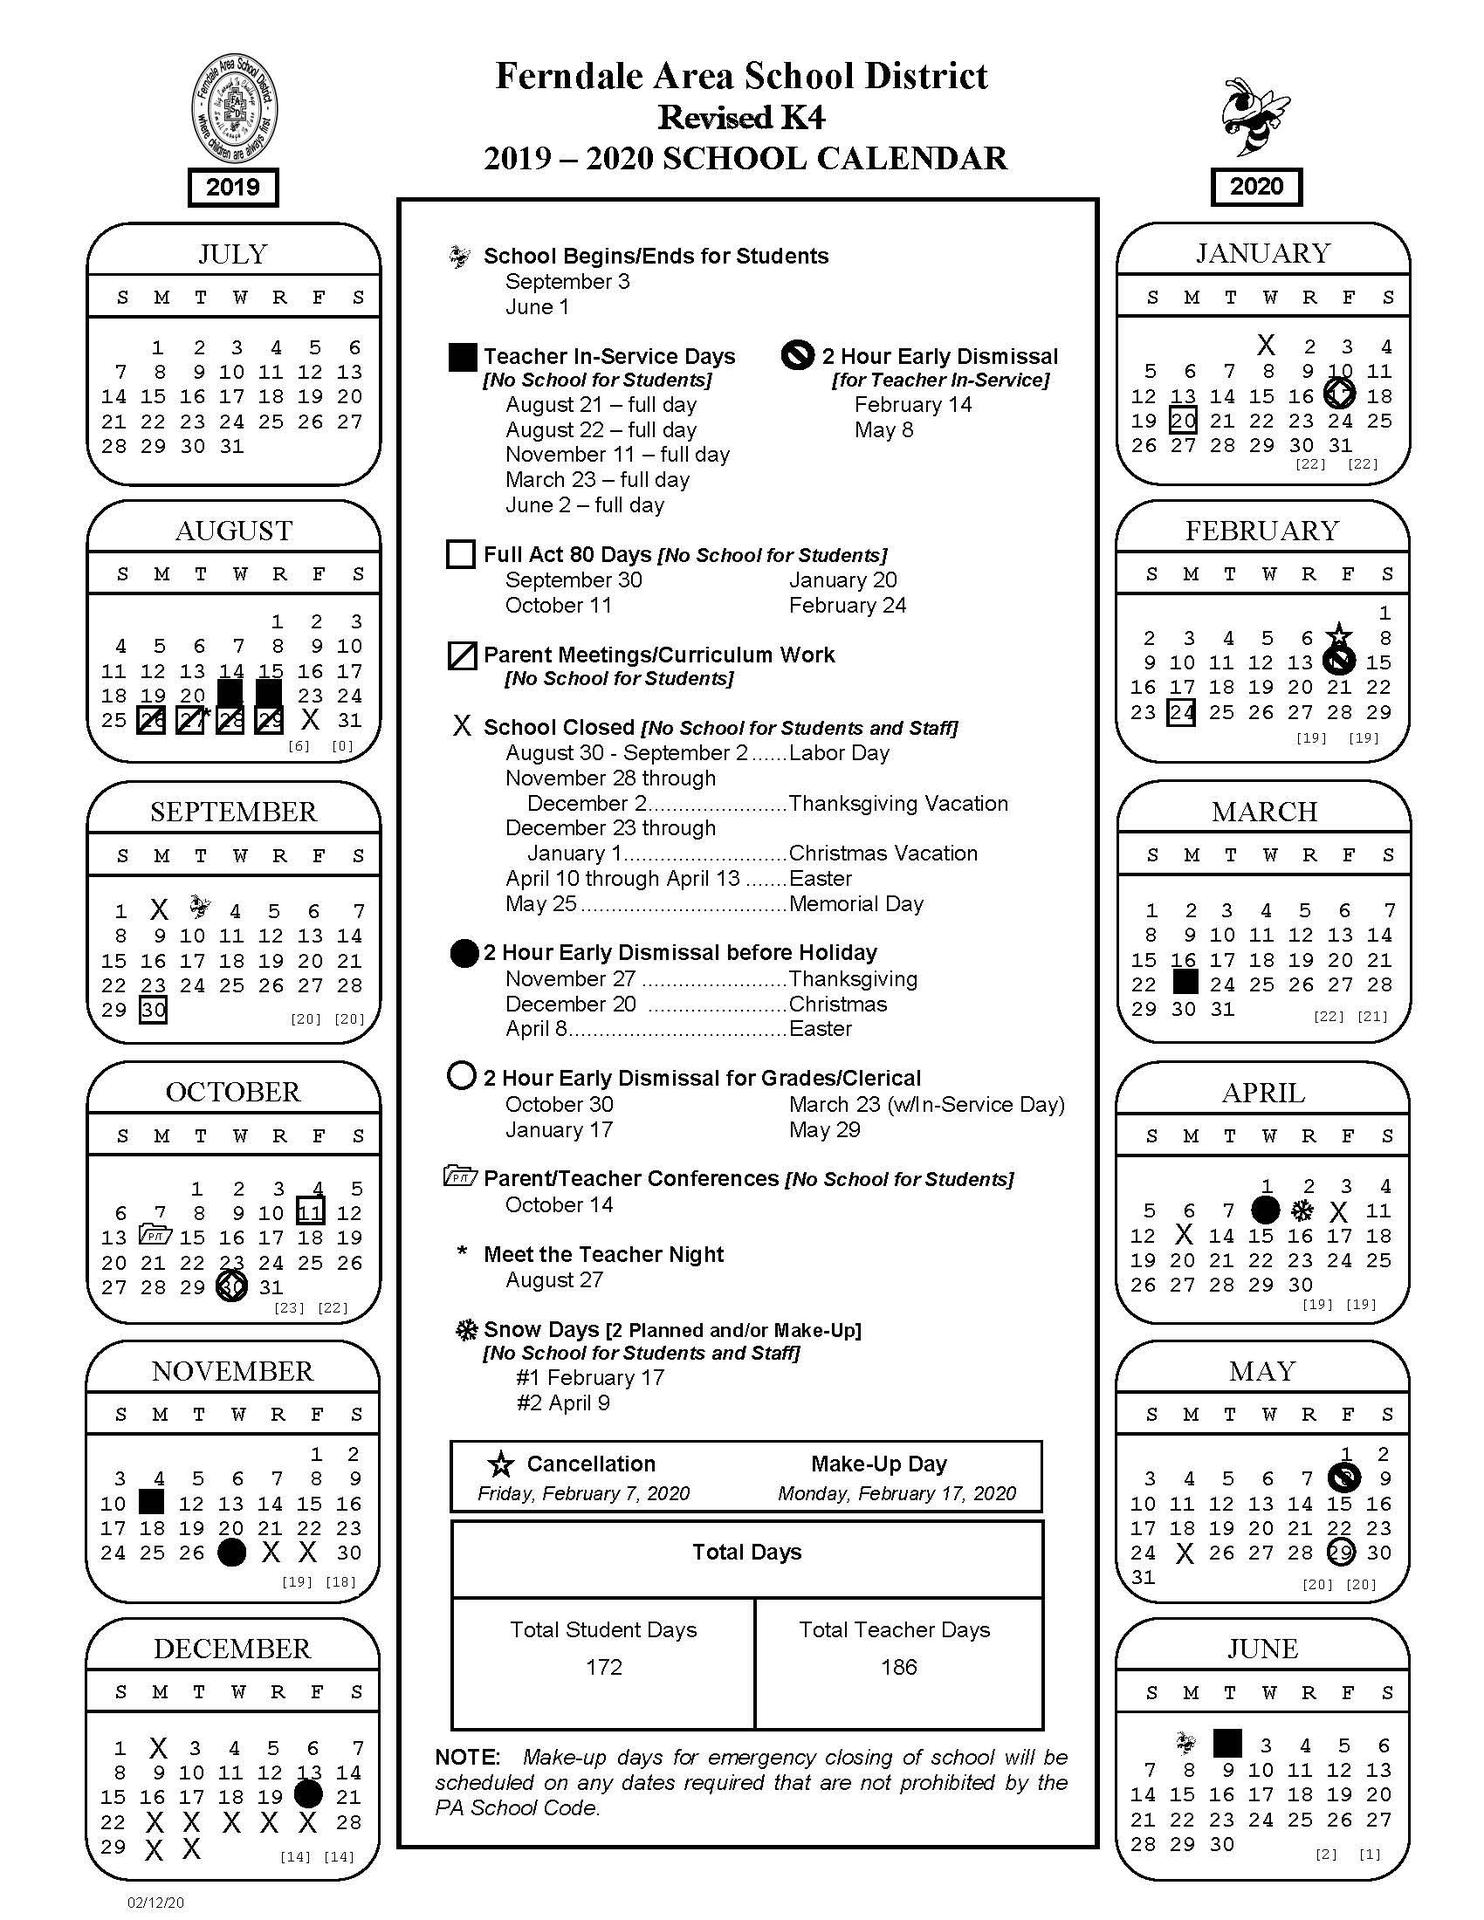 2019-2020 Revised K4 School Calendar